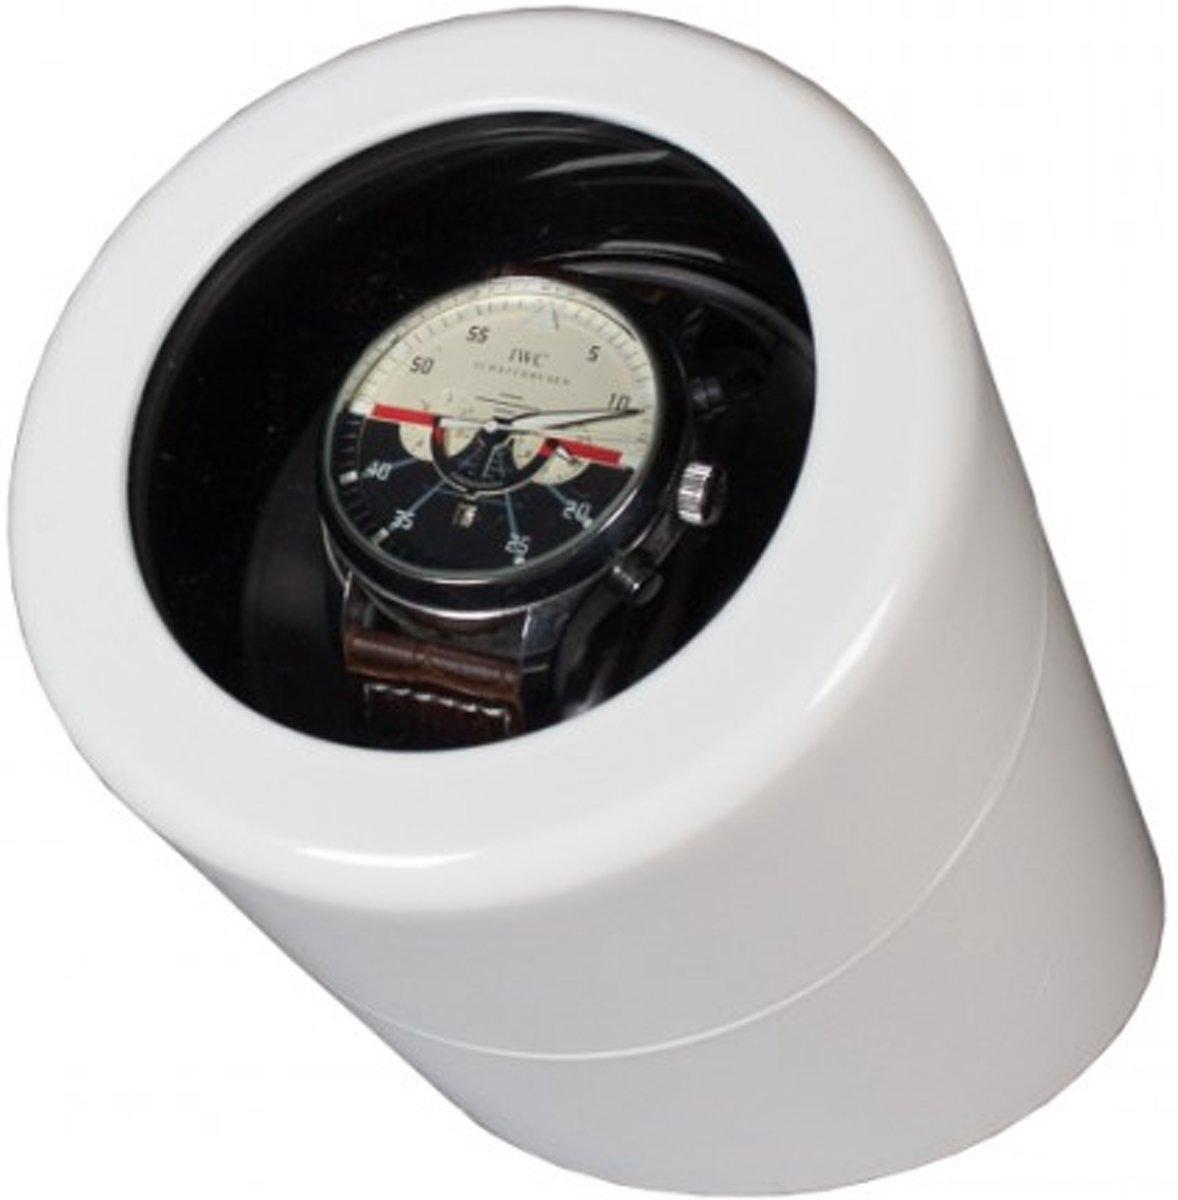 Rosenfelt watchwinder / horloge opwinder - LUKE kopen